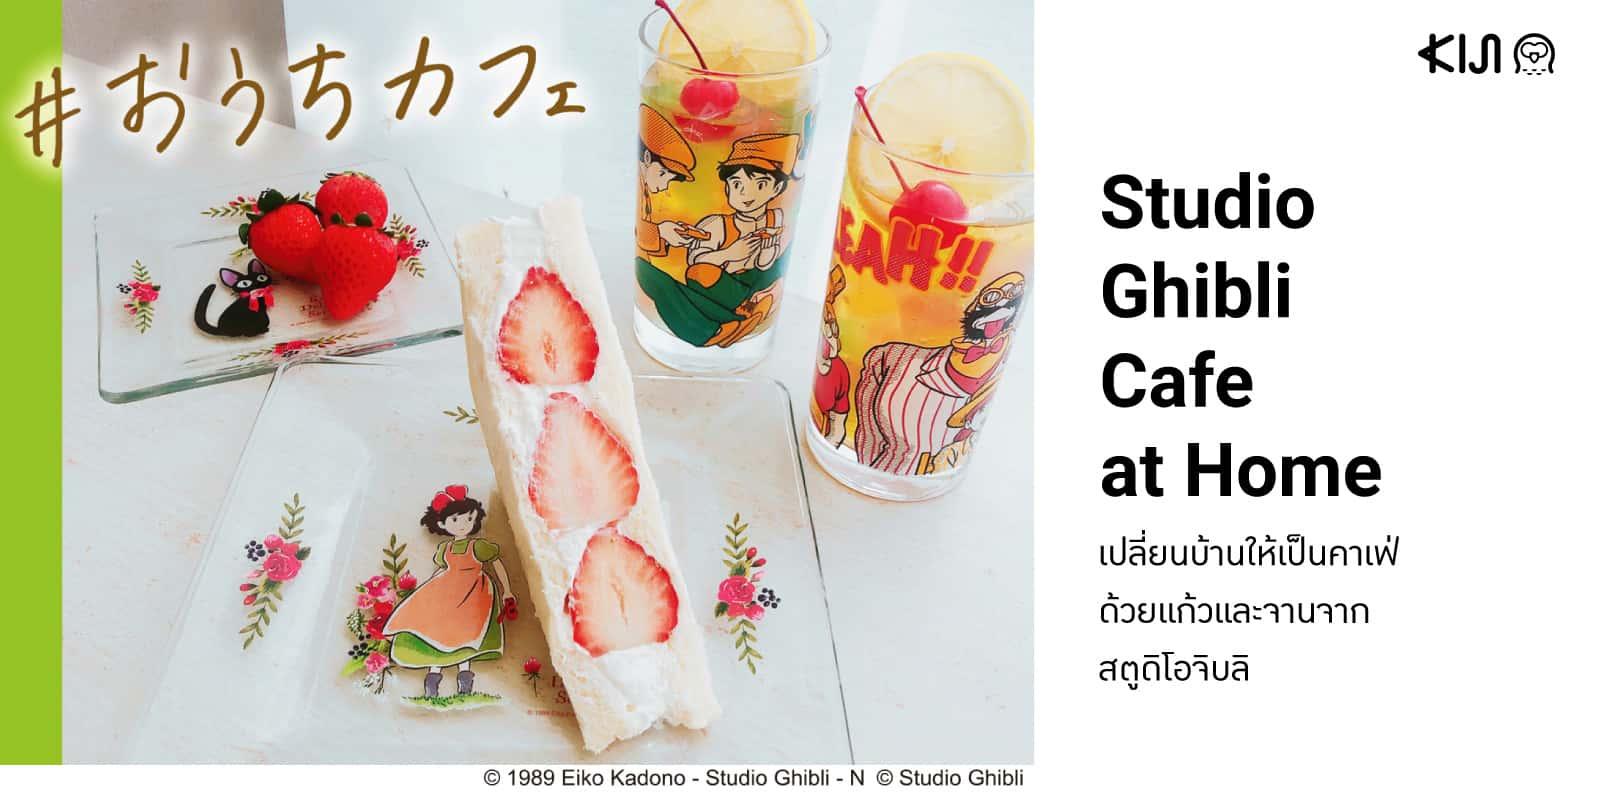 Ghibli Cafe at Home : เปลี่ยนบ้านให้เป็นคาเฟ่ด้วยแก้วและจานจากสตูดิโอจิบลิ